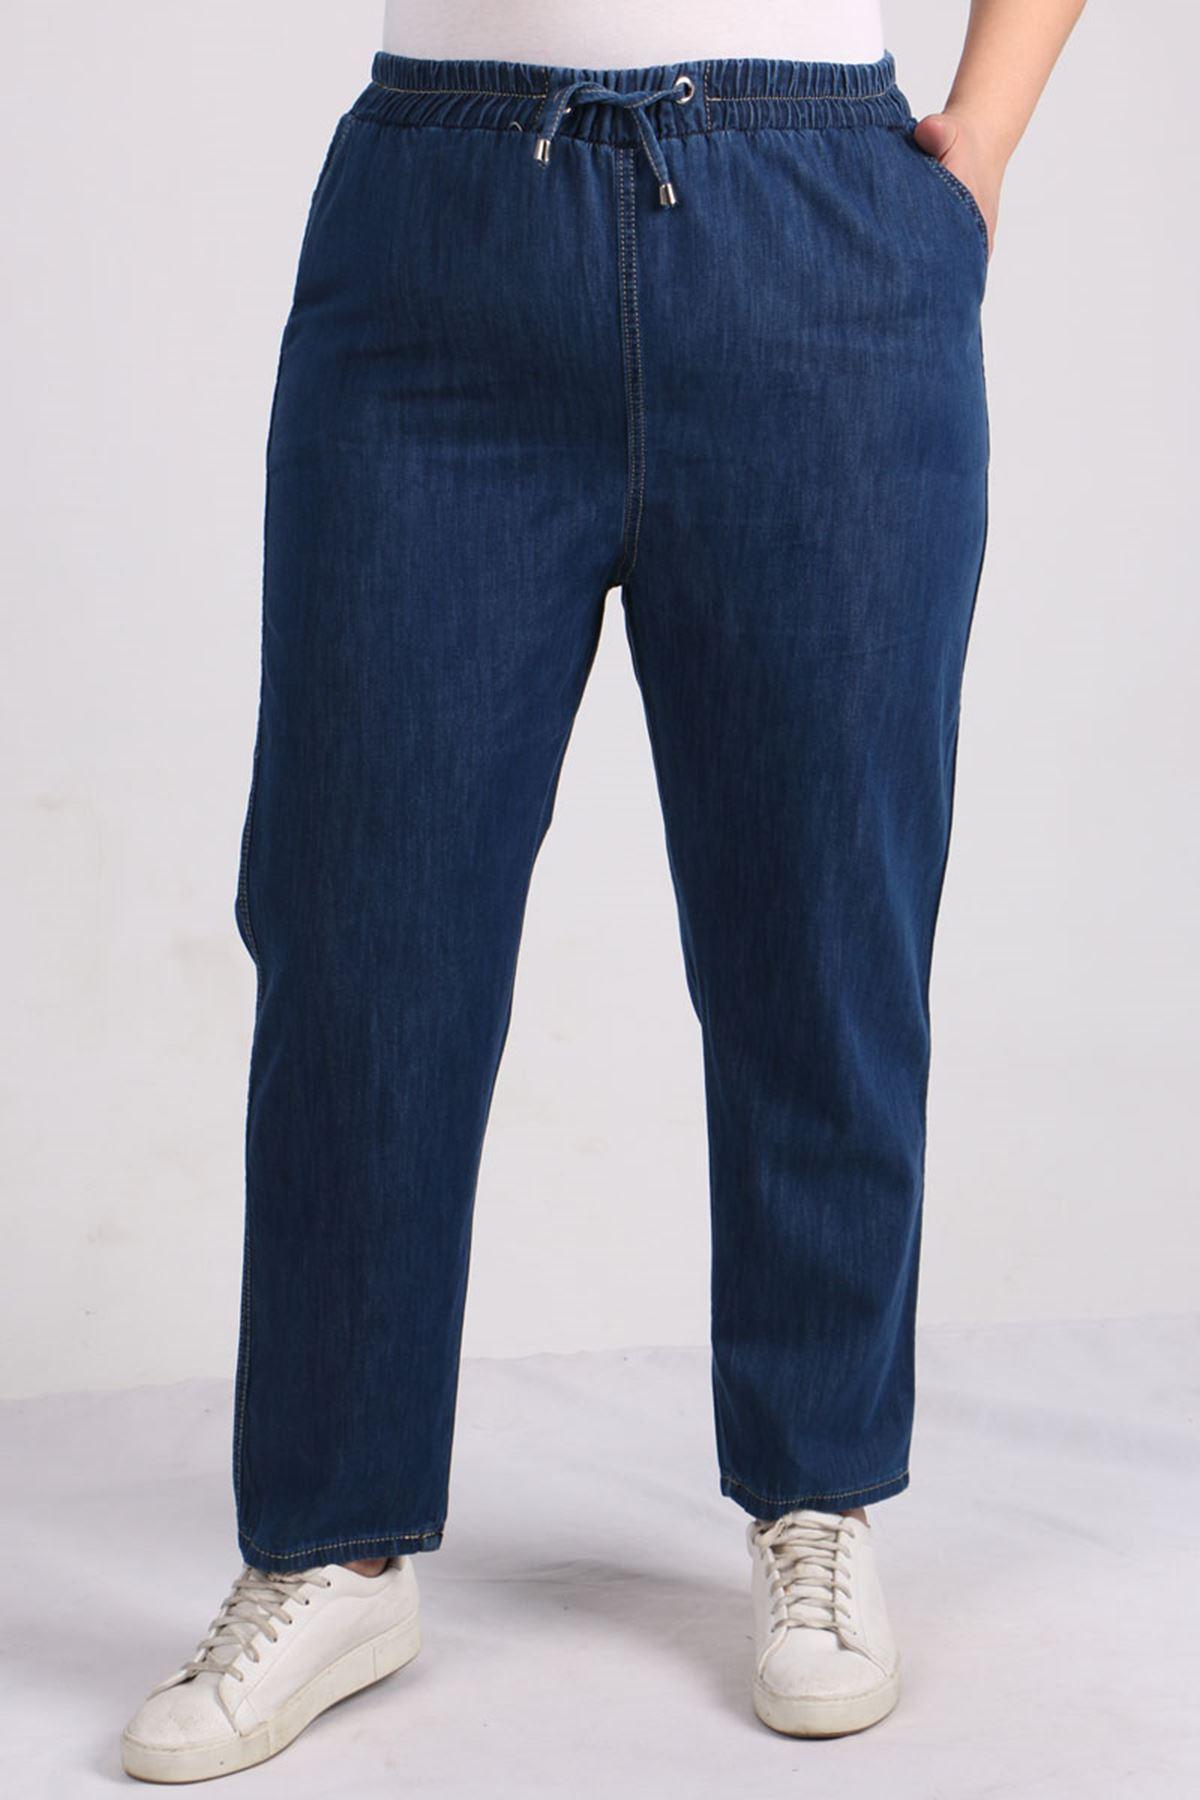 9123 Büyük Beden Beli Lastikli Dar Paça Kot Pantolon-Koyu Mavi